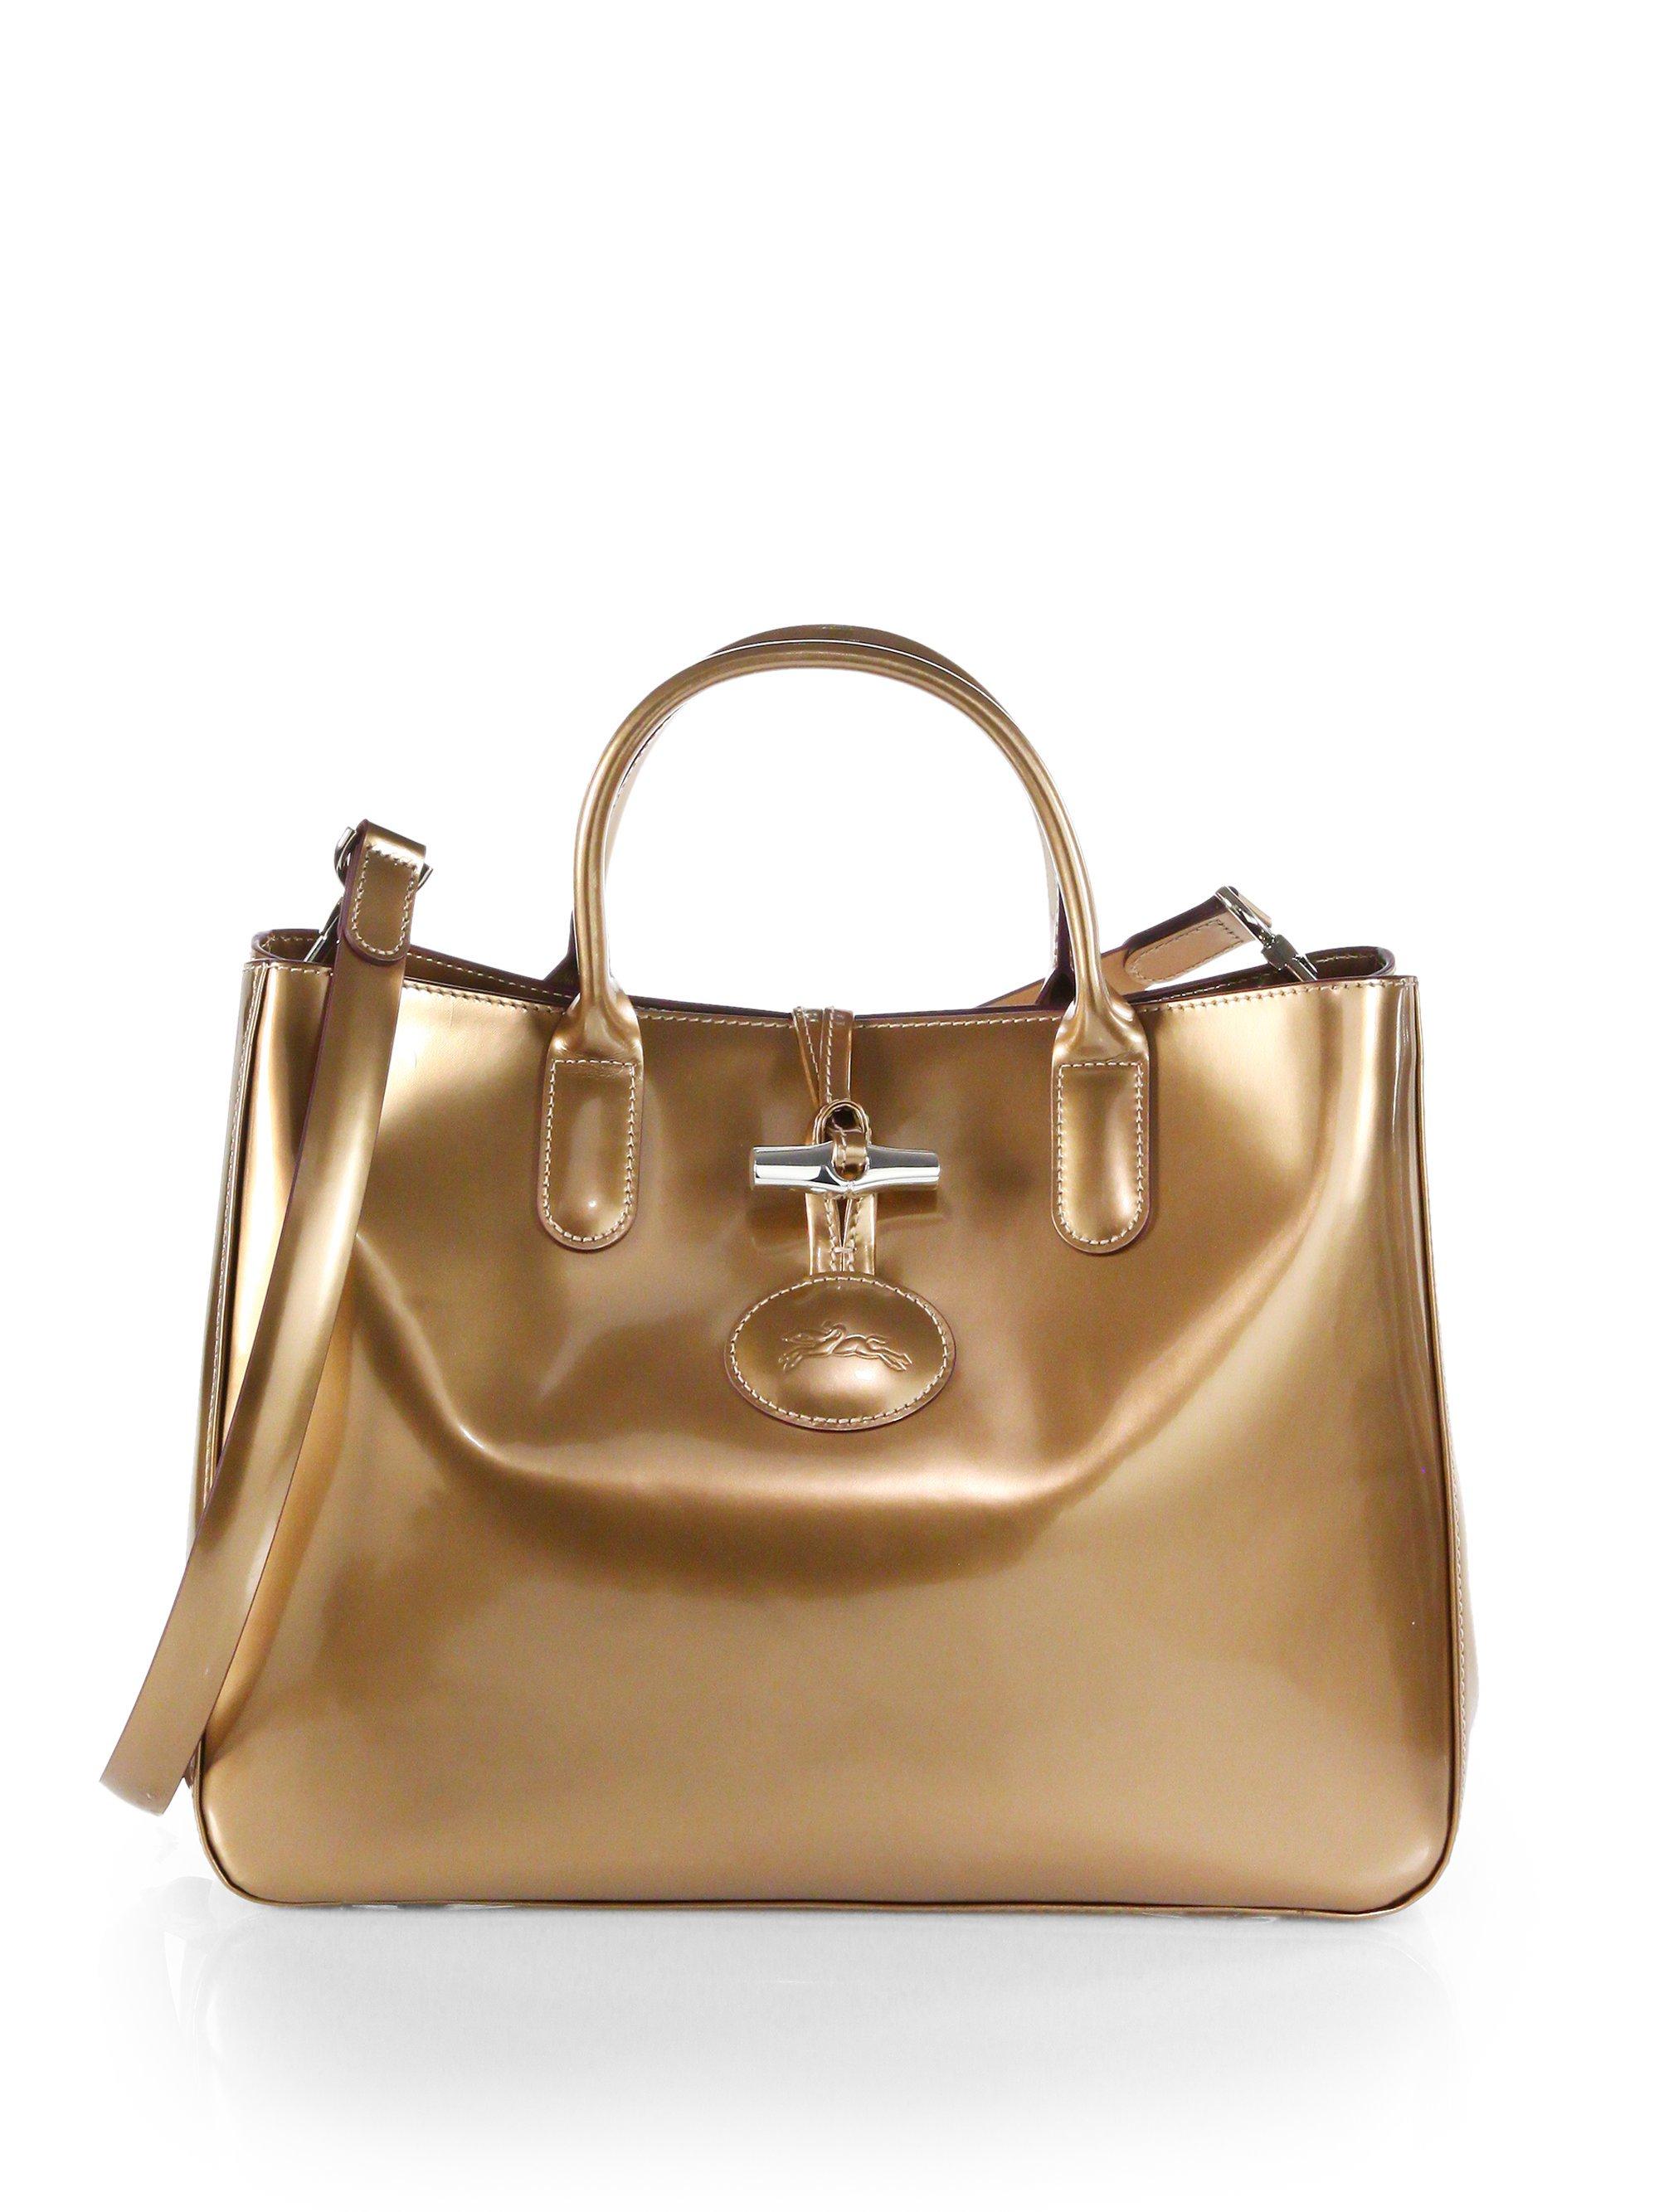 Lyst - Longchamp Roseau Metallic Patent Leather Box Tote in Metallic 28a441b8ade89